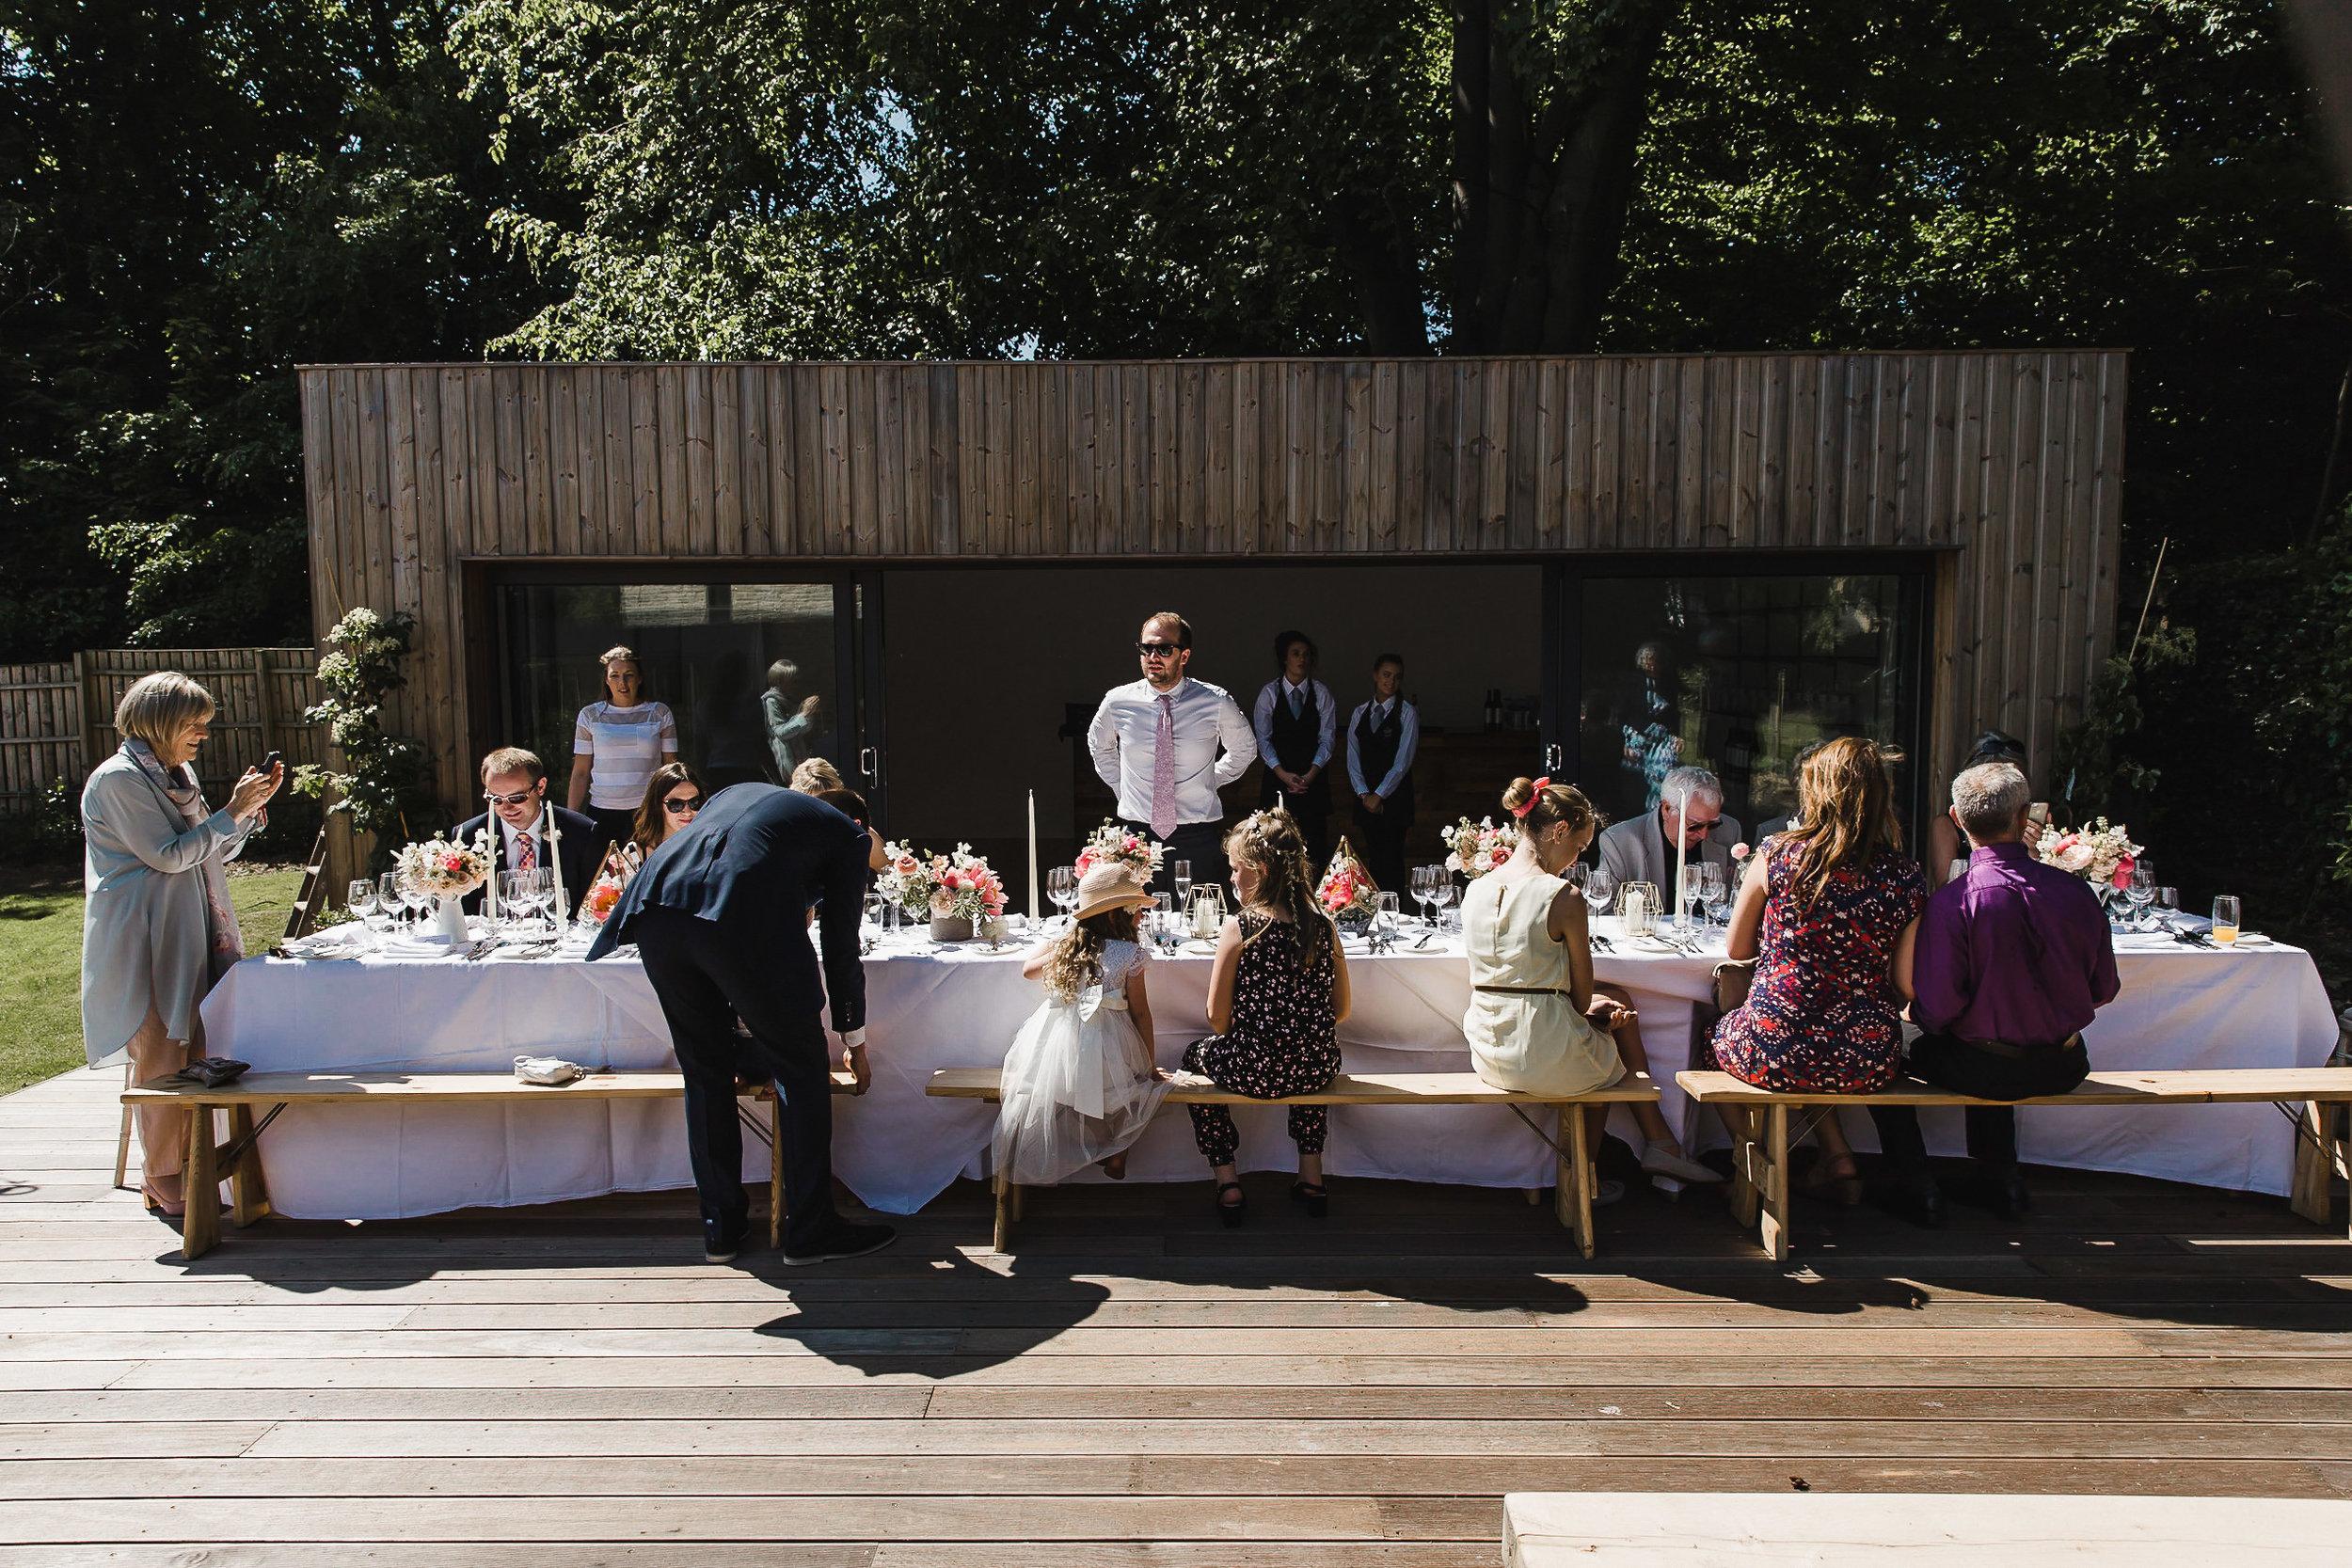 Roundhay-Leeds-Backyard-Wedding-Becs-Chris-130.jpg